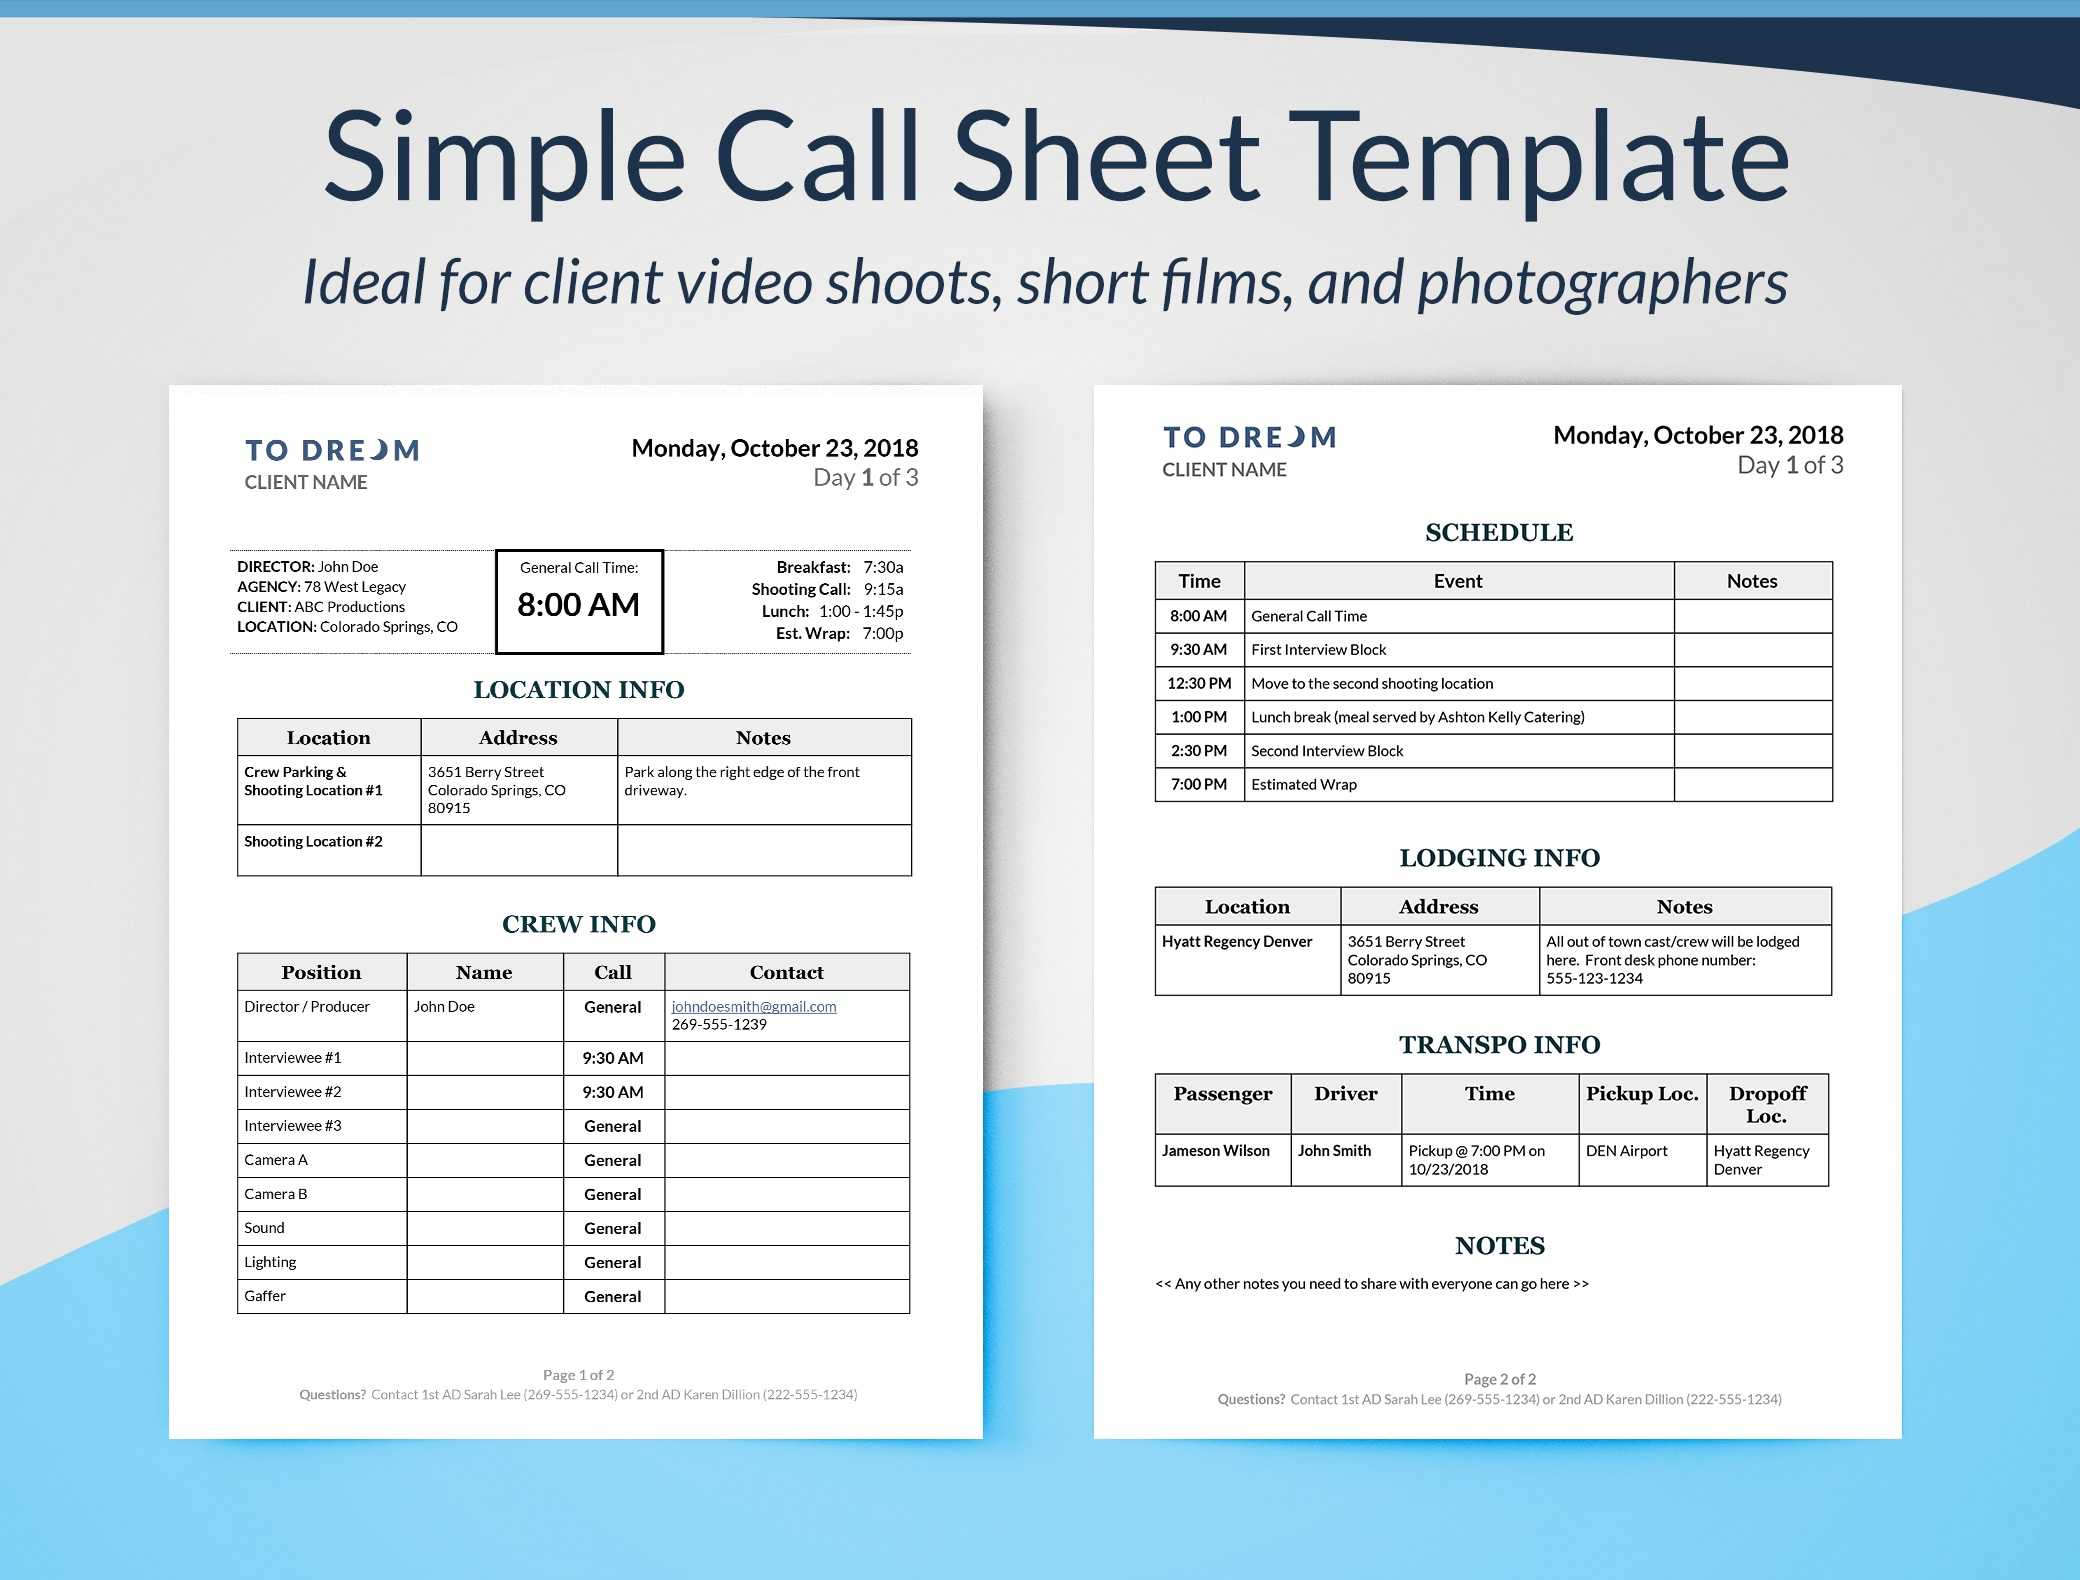 Simple Call Sheet Template Word Doc   Sethero For Film Call Sheet Template Word